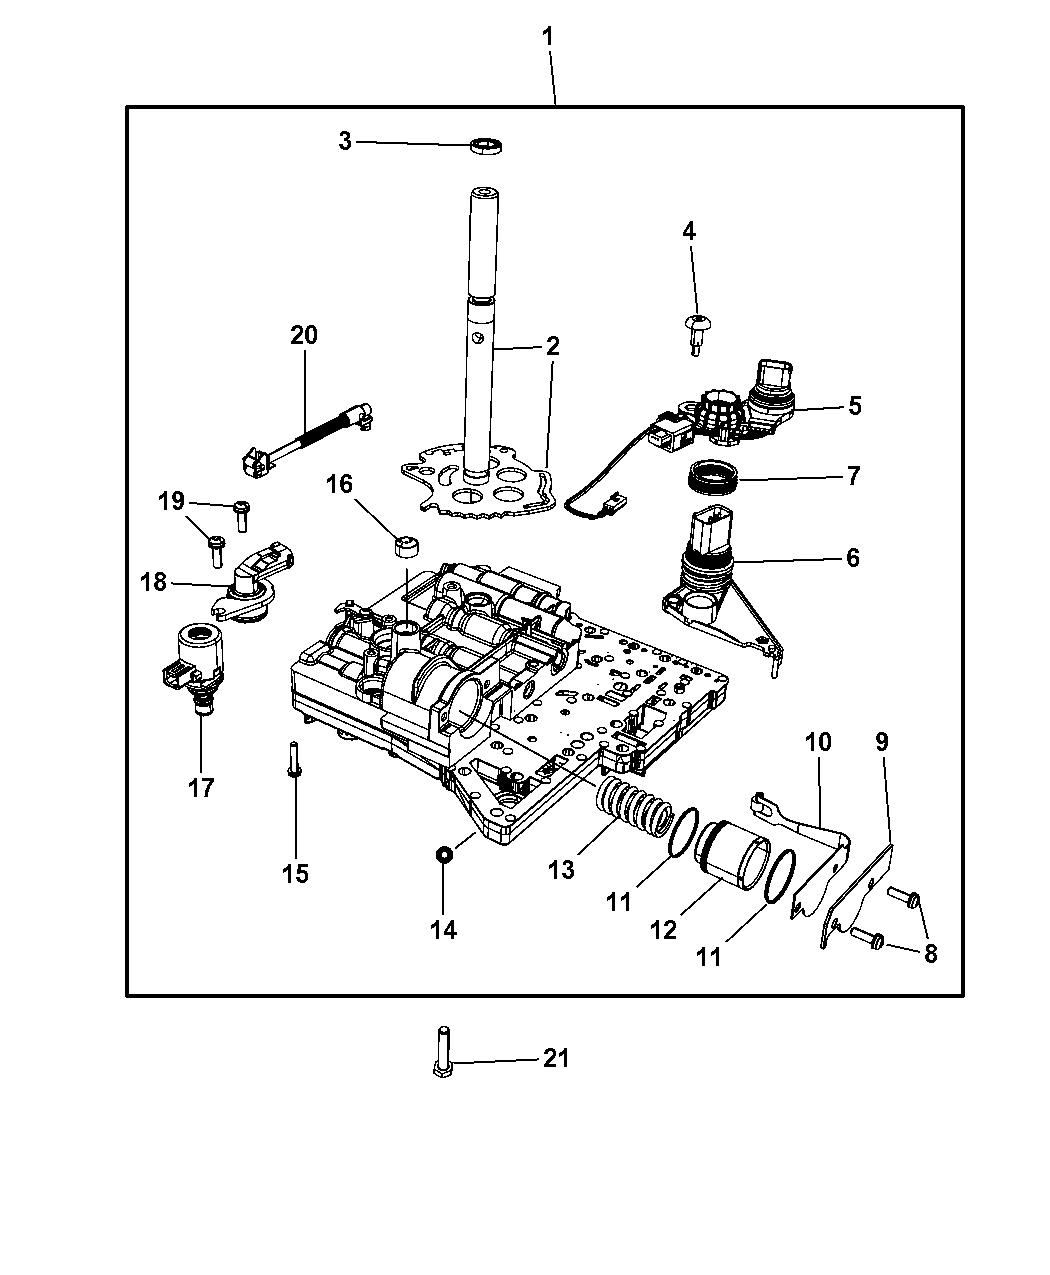 2009 Chrysler Pt Cruiser Valve Body Related Parts Fuel Filter